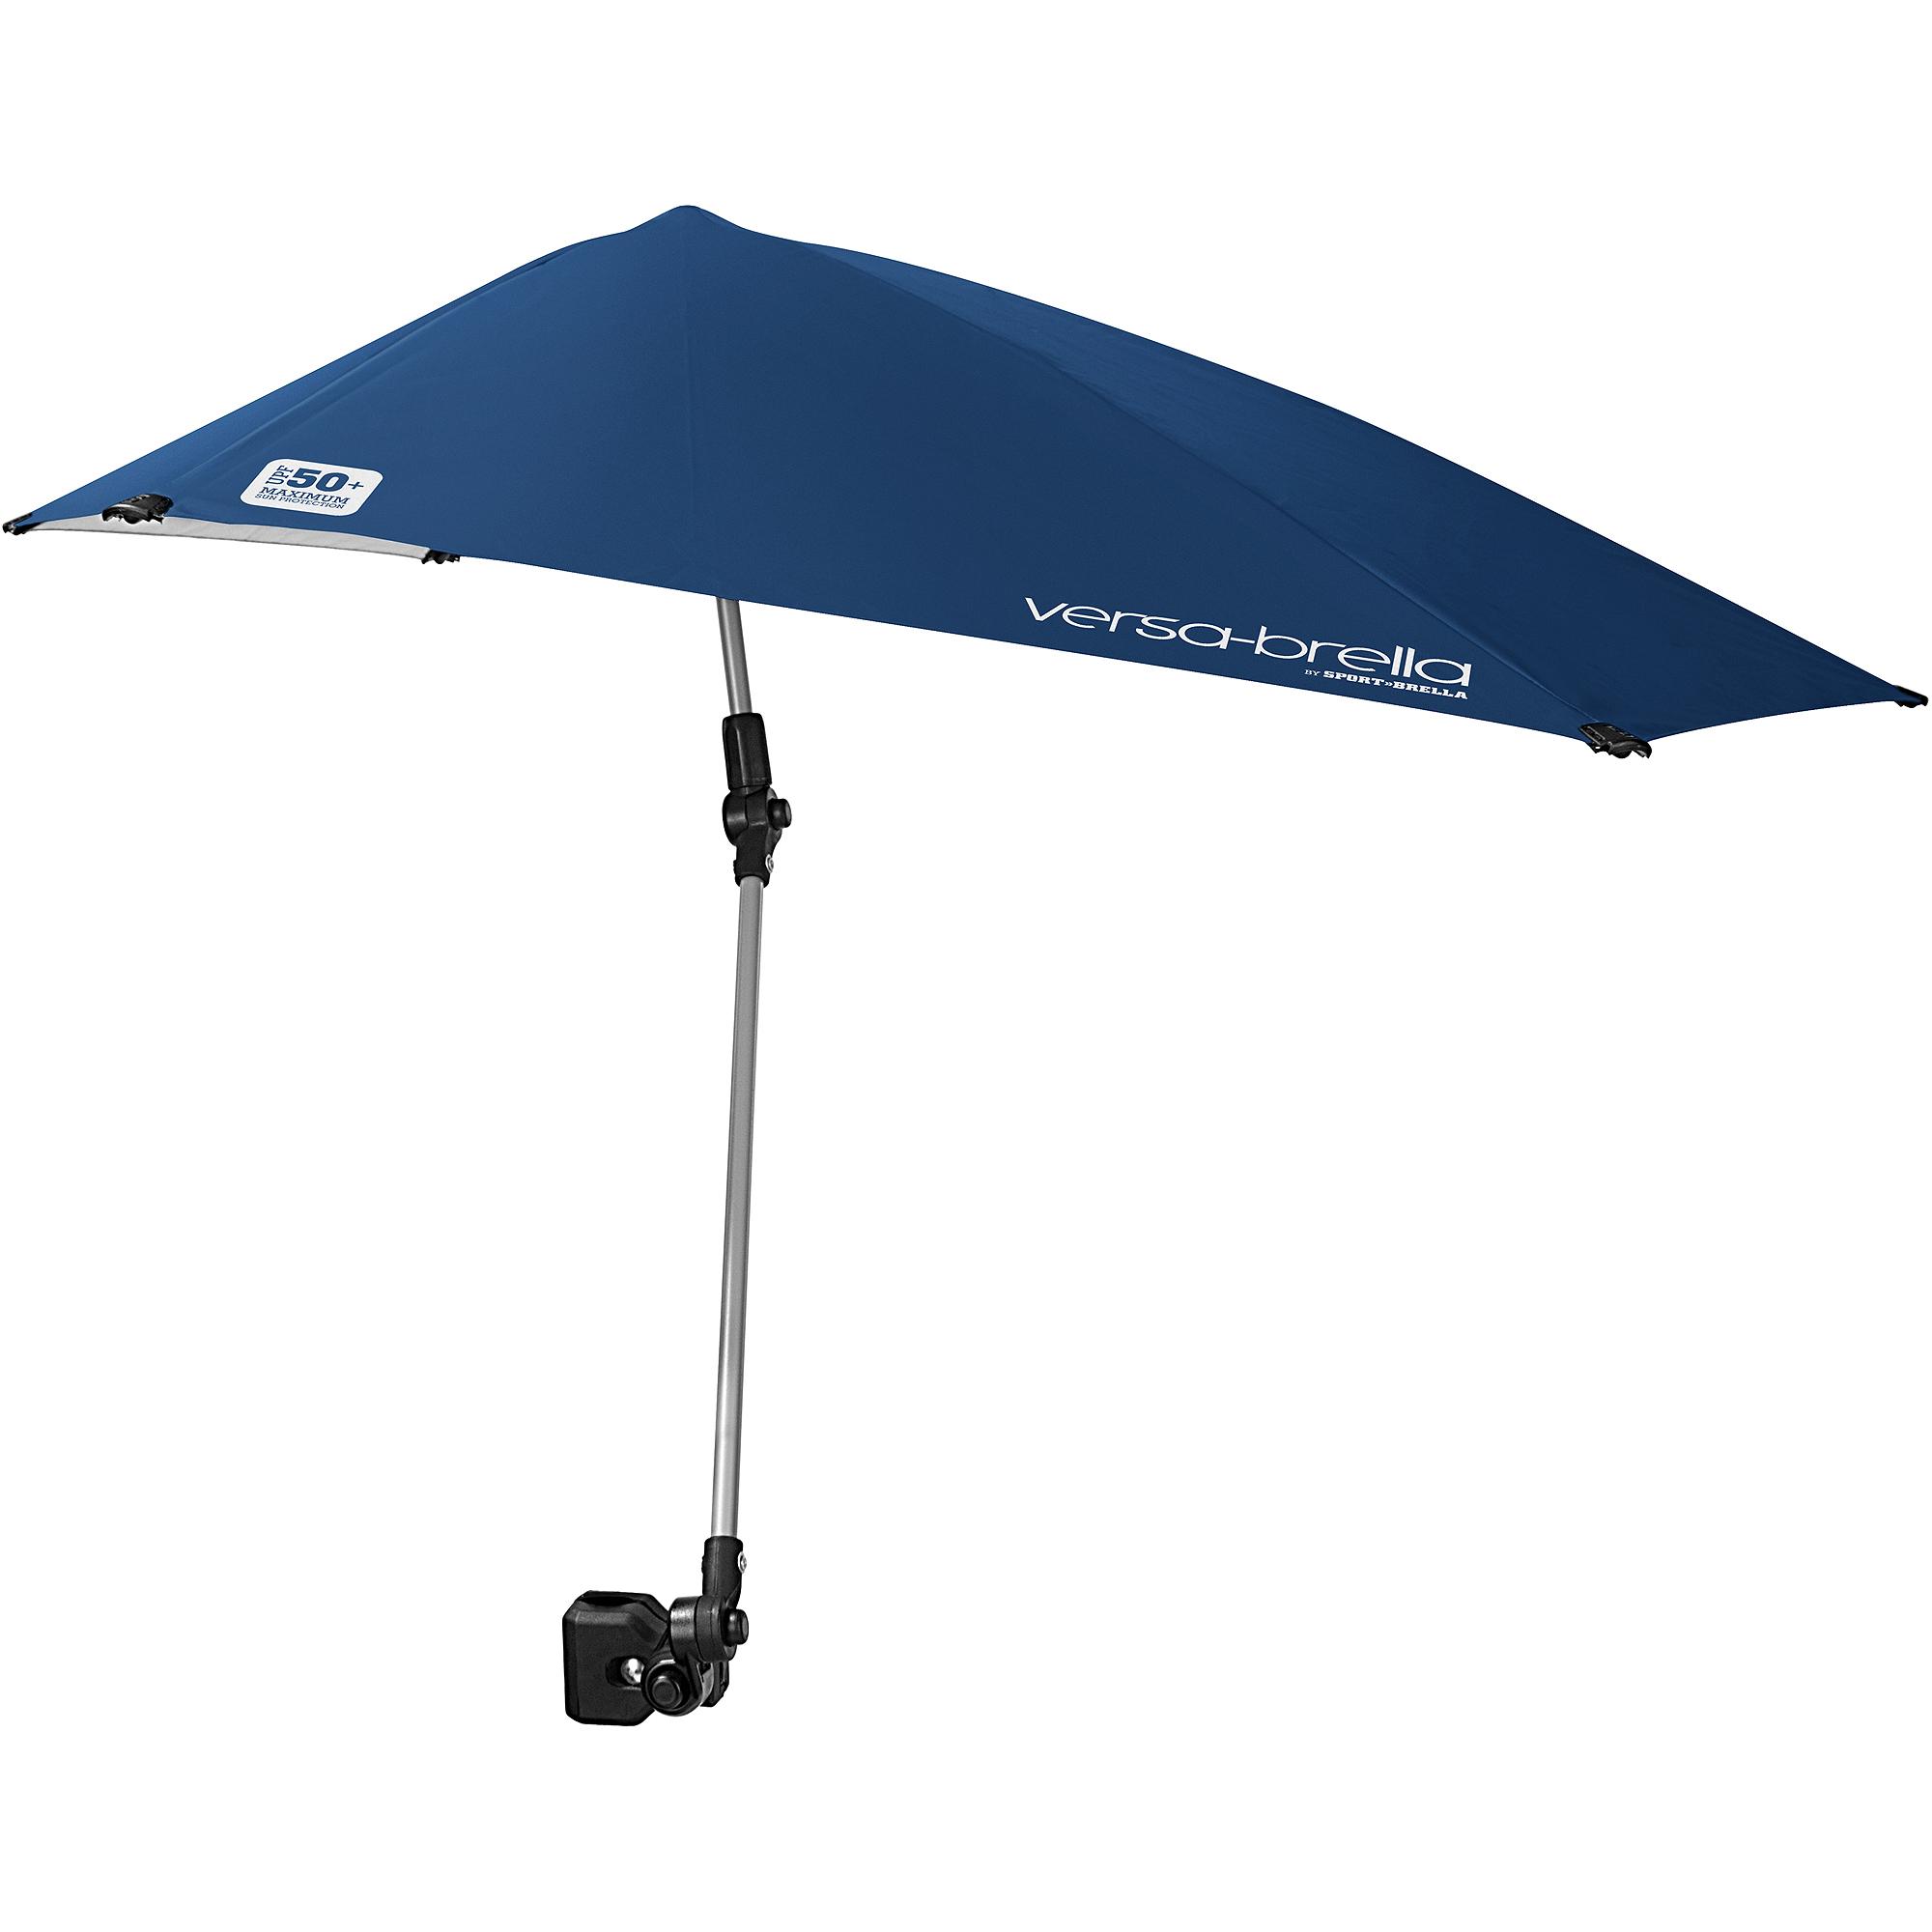 Versa Brella 360 Degree Clip Umbrella Midnight Blue Walmart Com